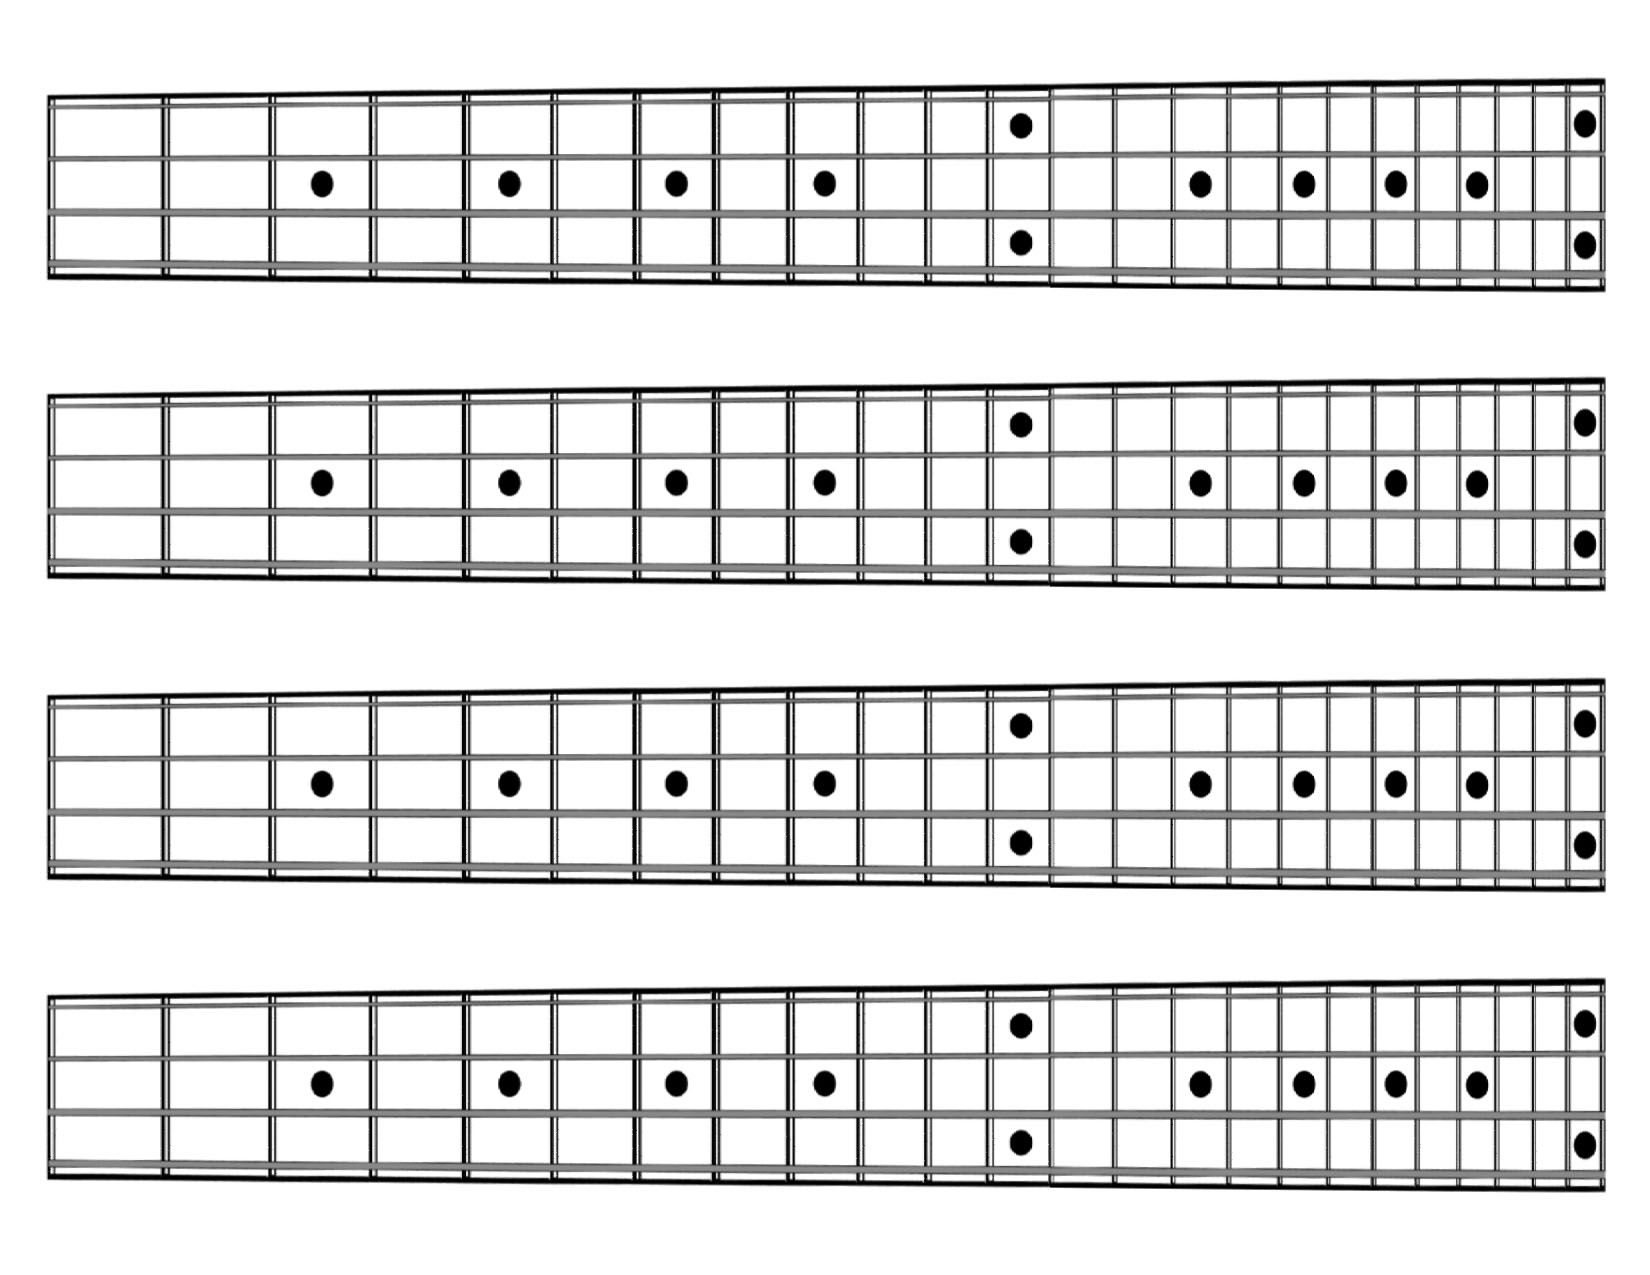 Bass Neck Diagram Autometer Temp Gauge Wiring Http Basschat Co Uk Uploads Monthly 01 2009 Post 291